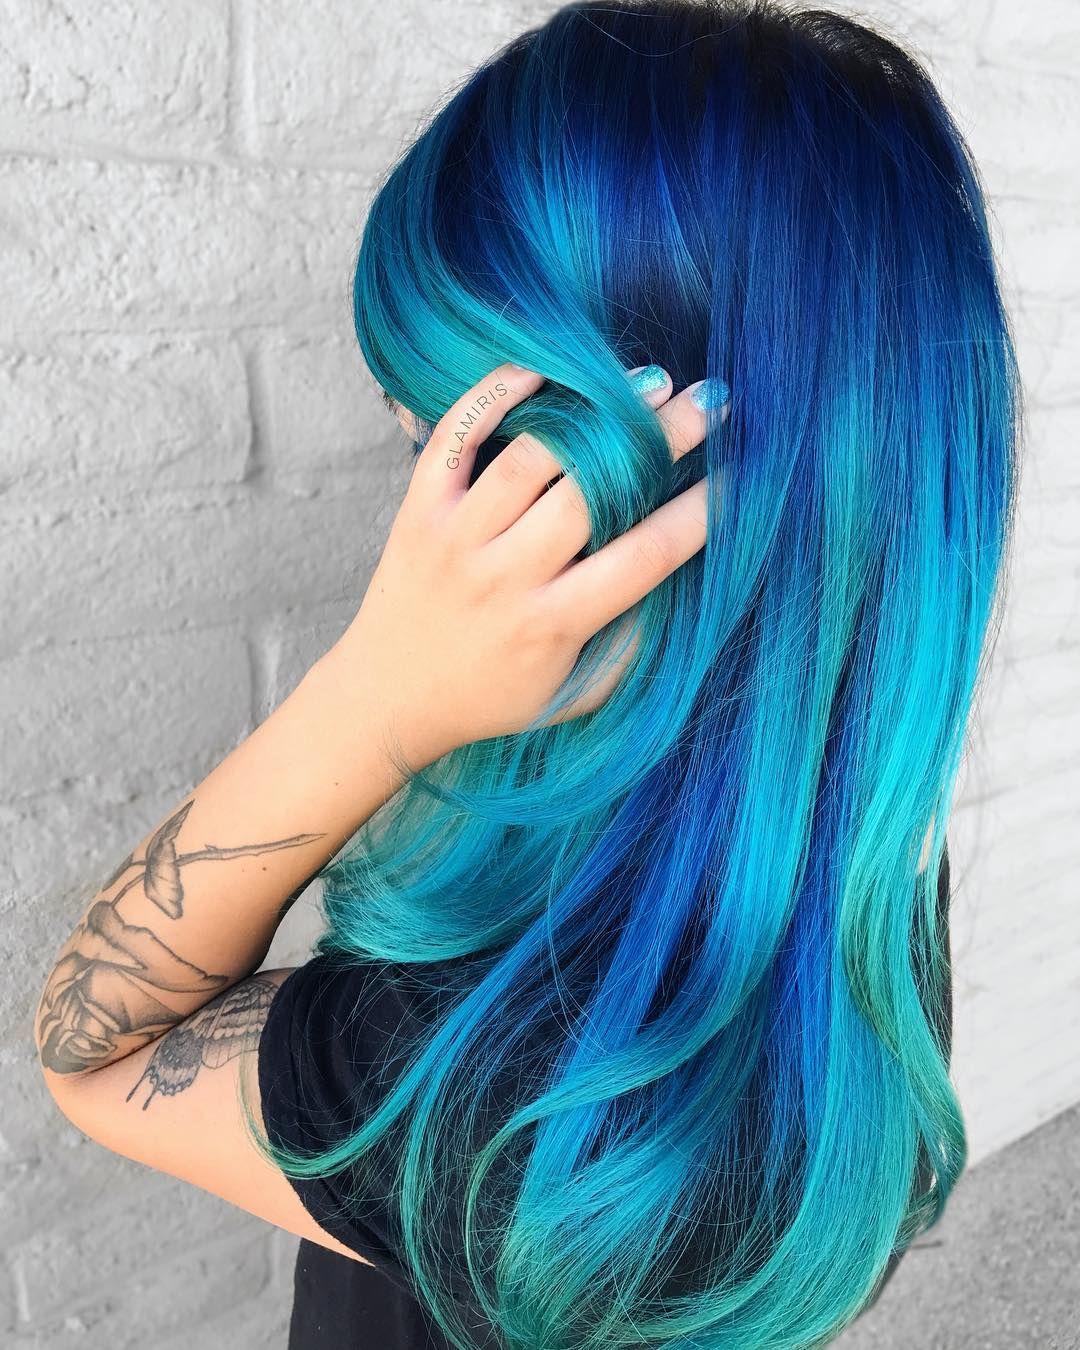 Ocean Hair Trend takes blue hair to the next level bob hairstyles | hairstyles 2018 – latest hairstyles 2018 – hair models 2018